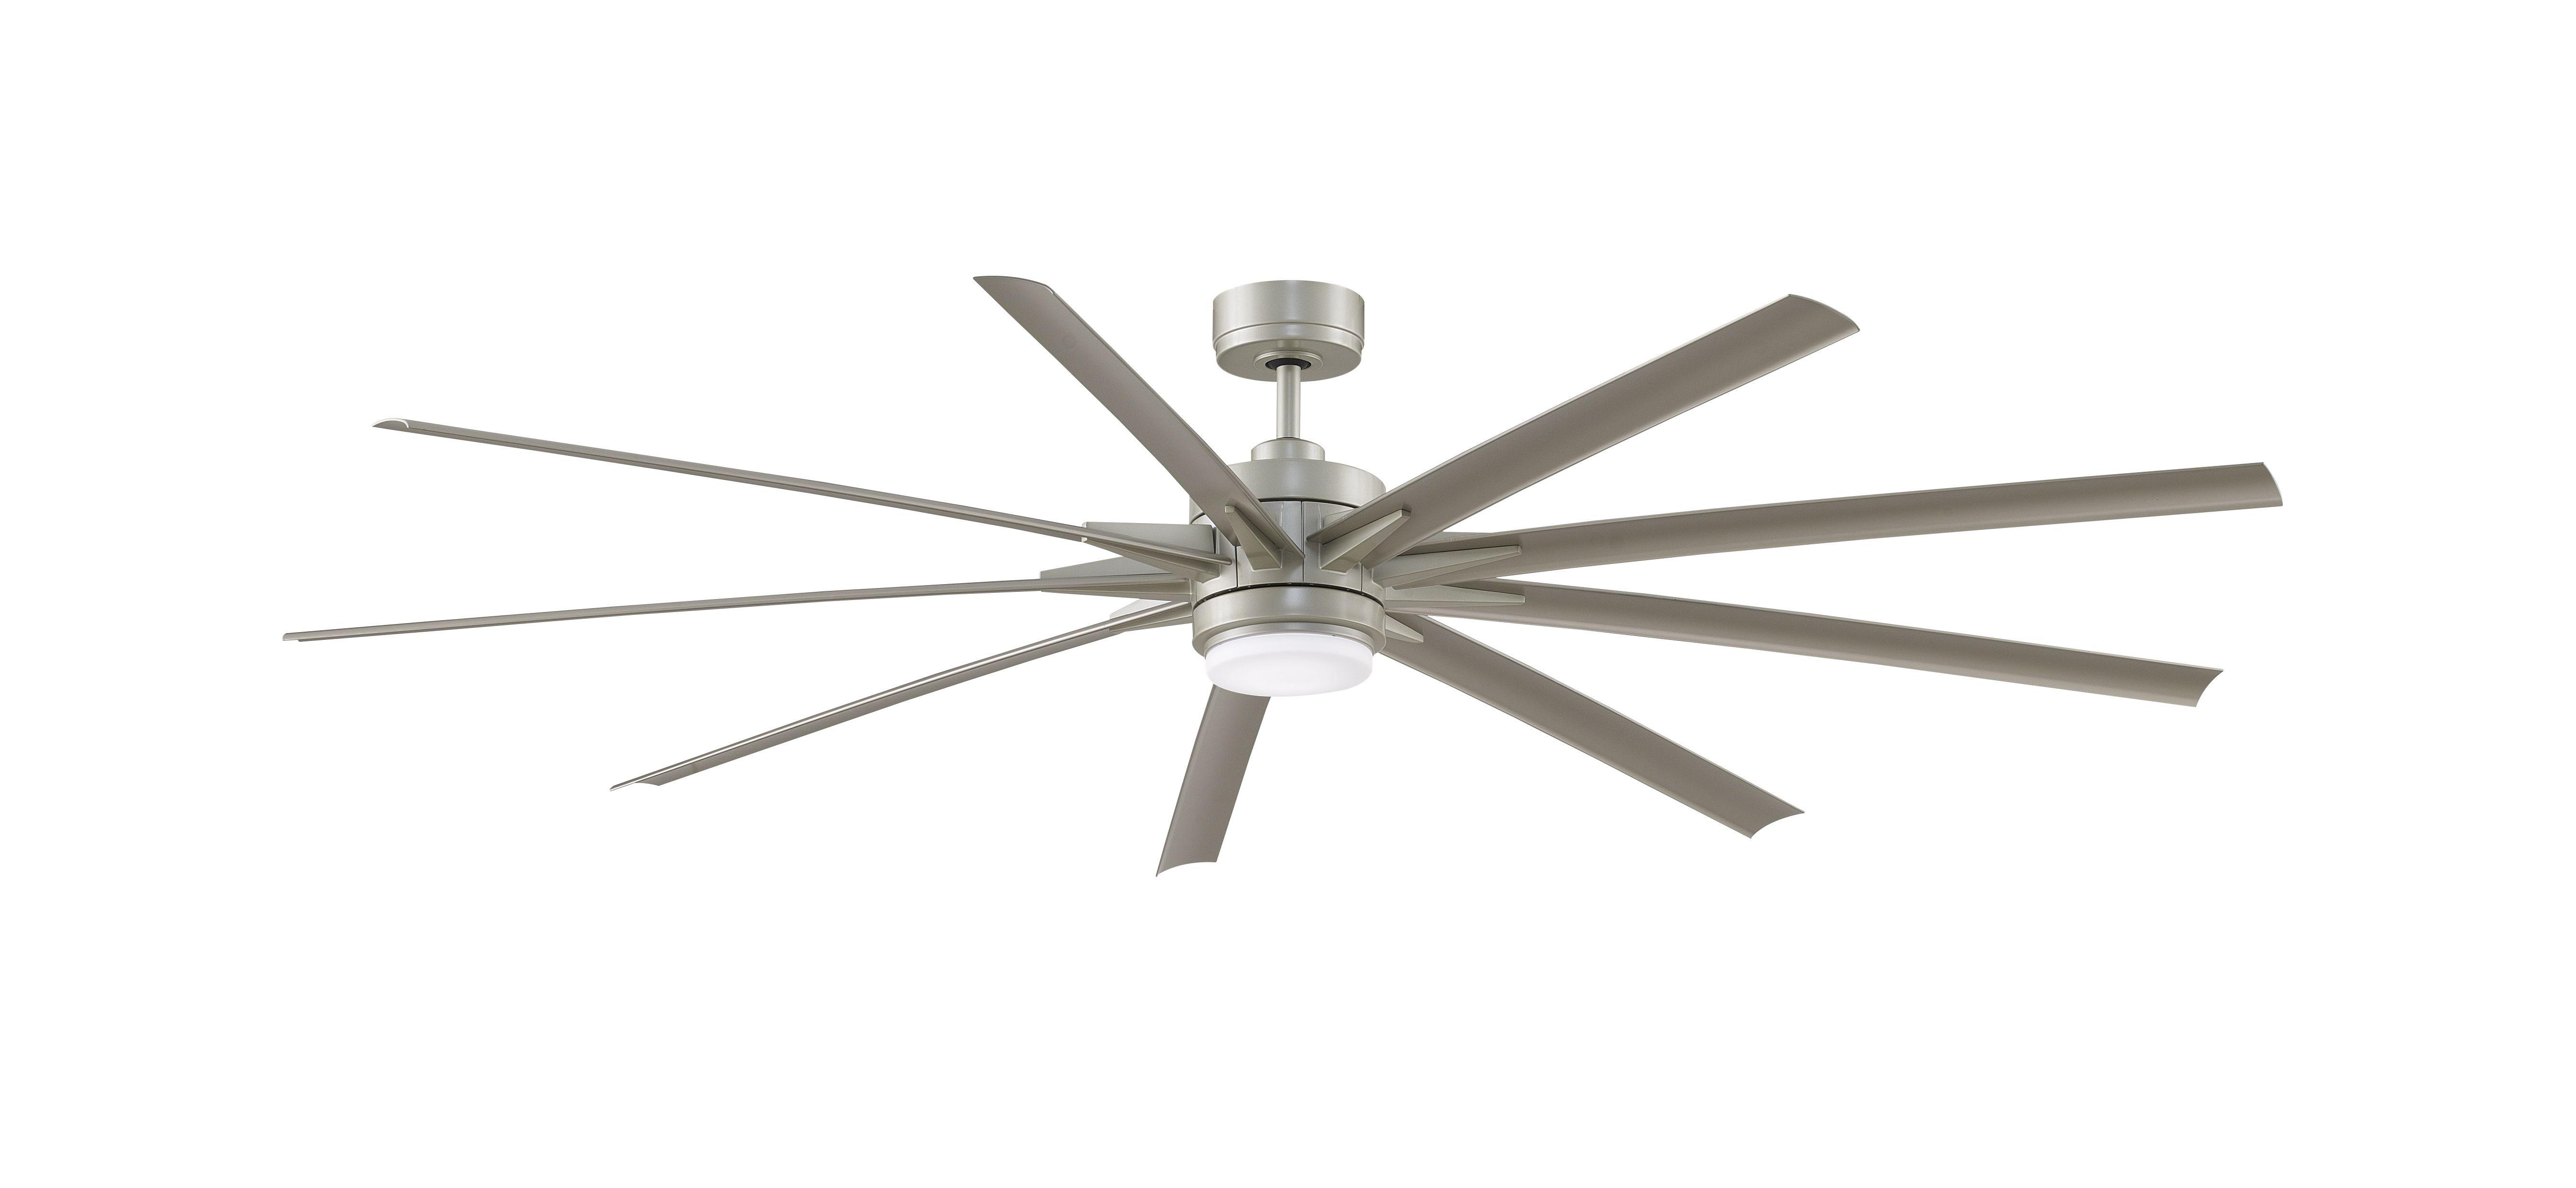 Fanimation Odyn 84 Indoor Outdoor 9 Blade Ceiling Fan With Light In Brushed Nickel